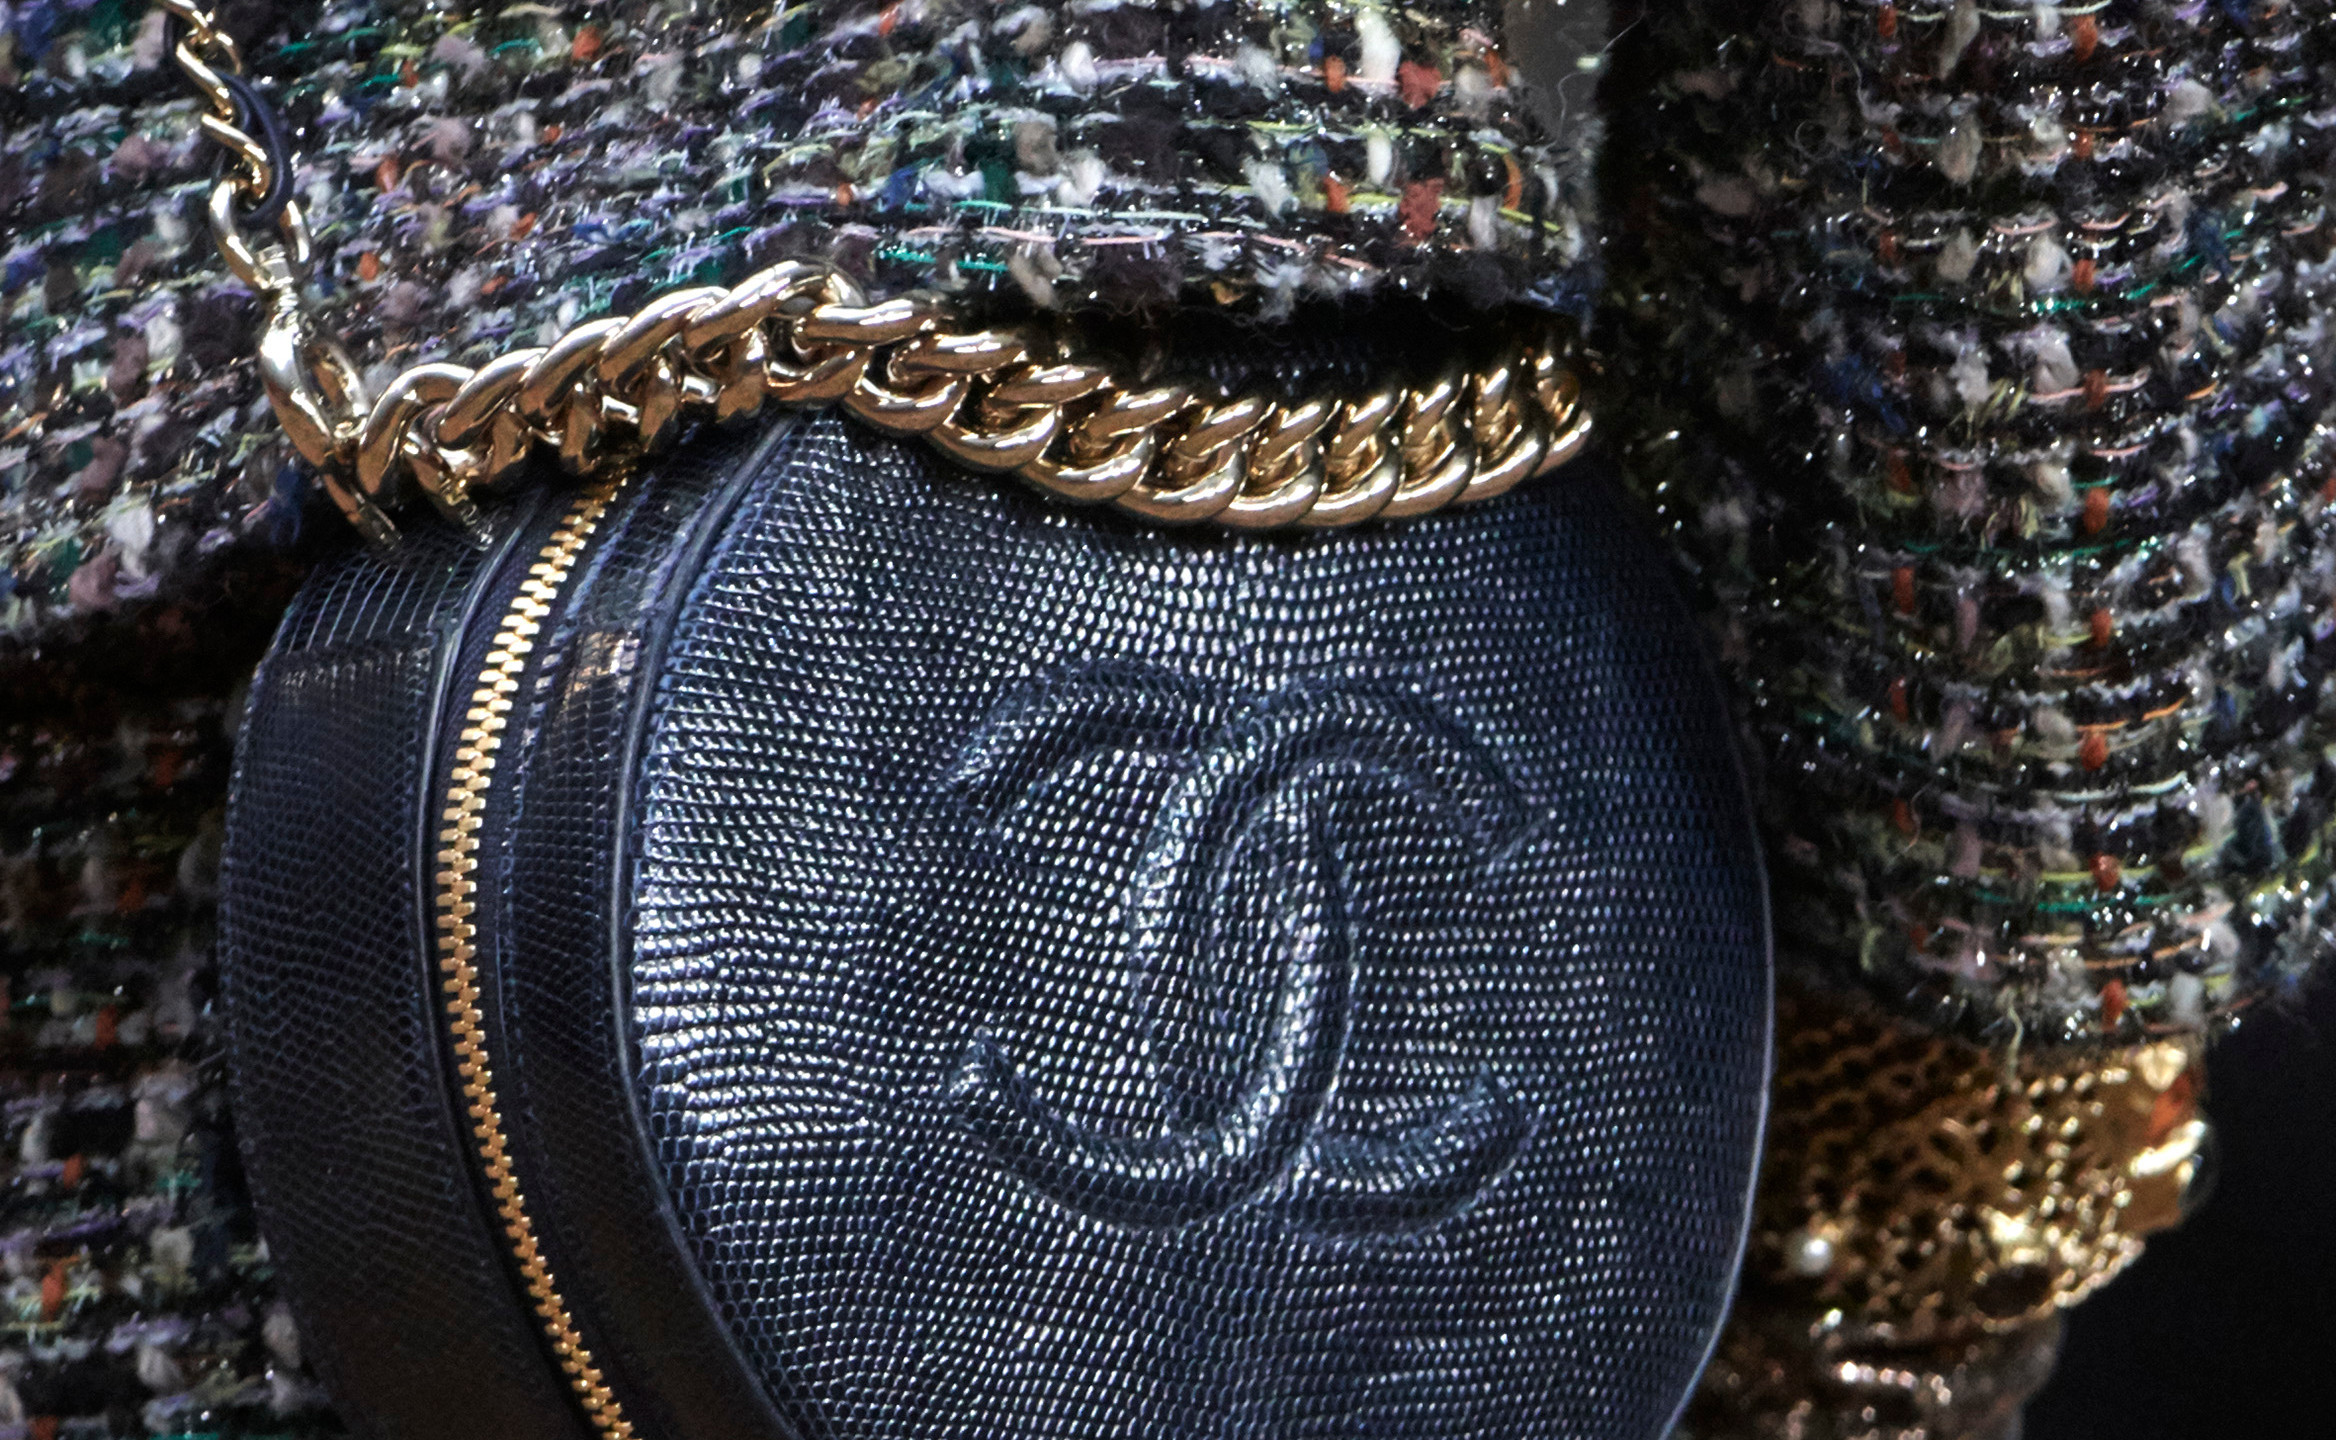 Detalhes Chanel inverno 18/19